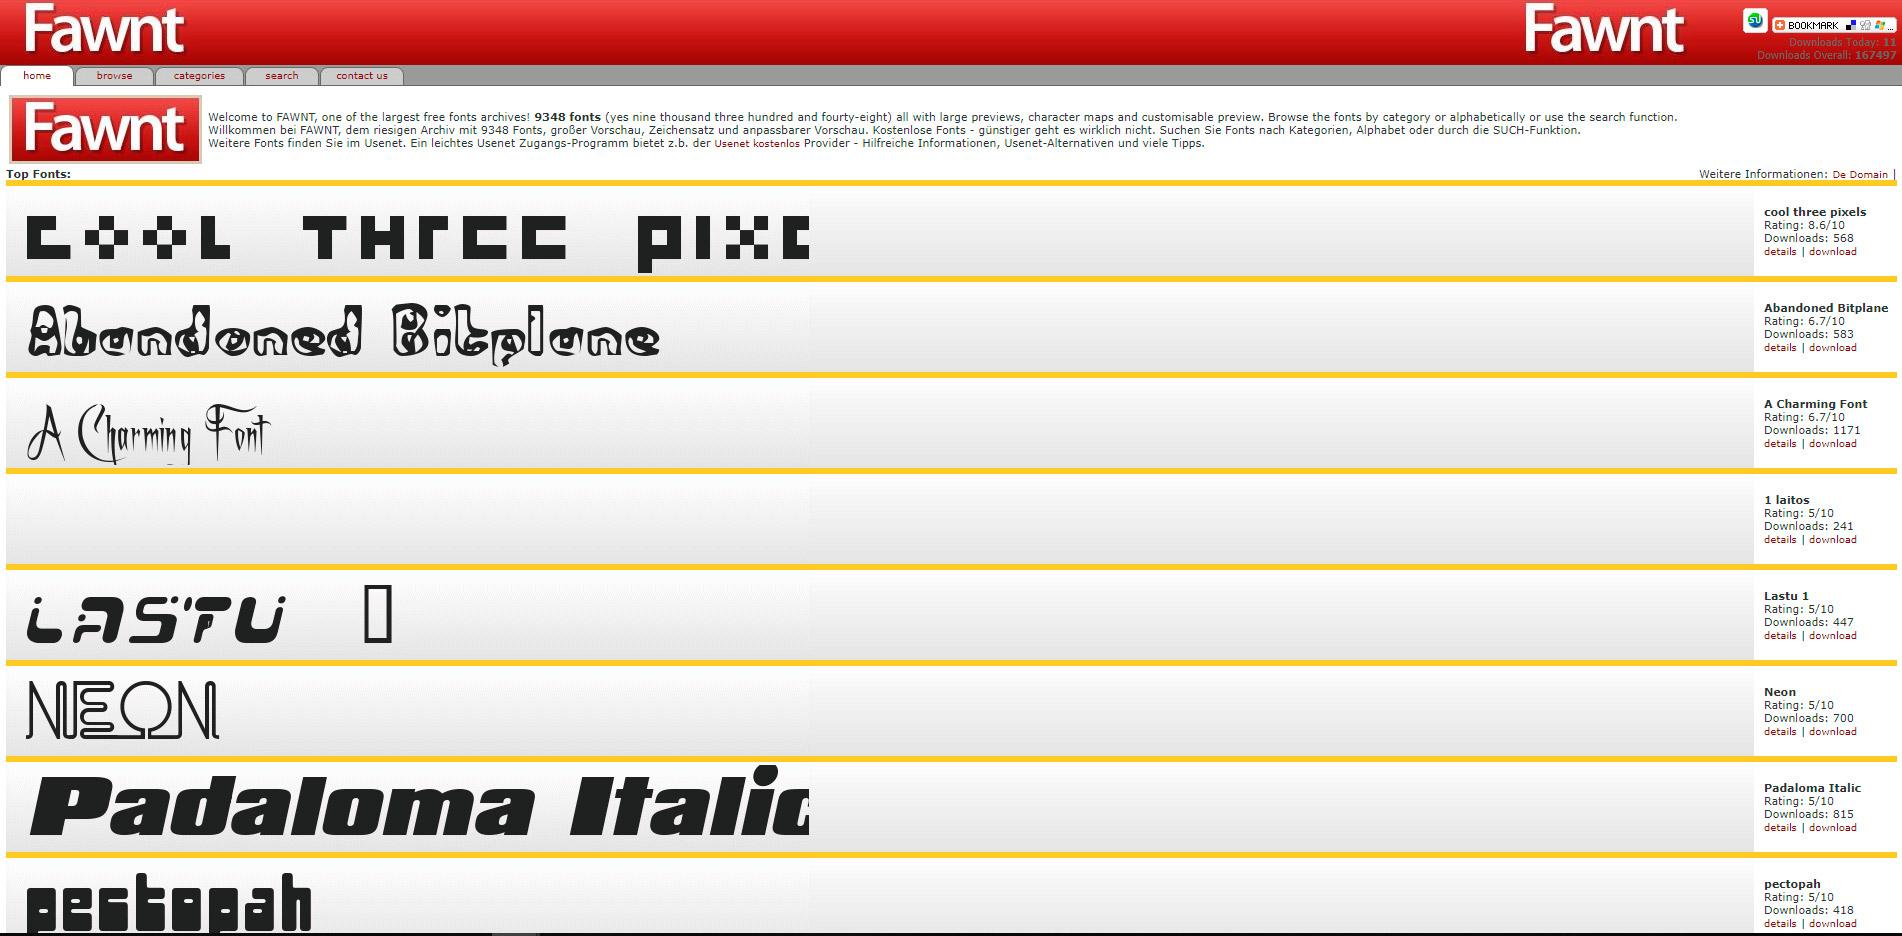 020_mejores_sitios_descarga_gratis_tipografia_fuentes_fonts__fawnt